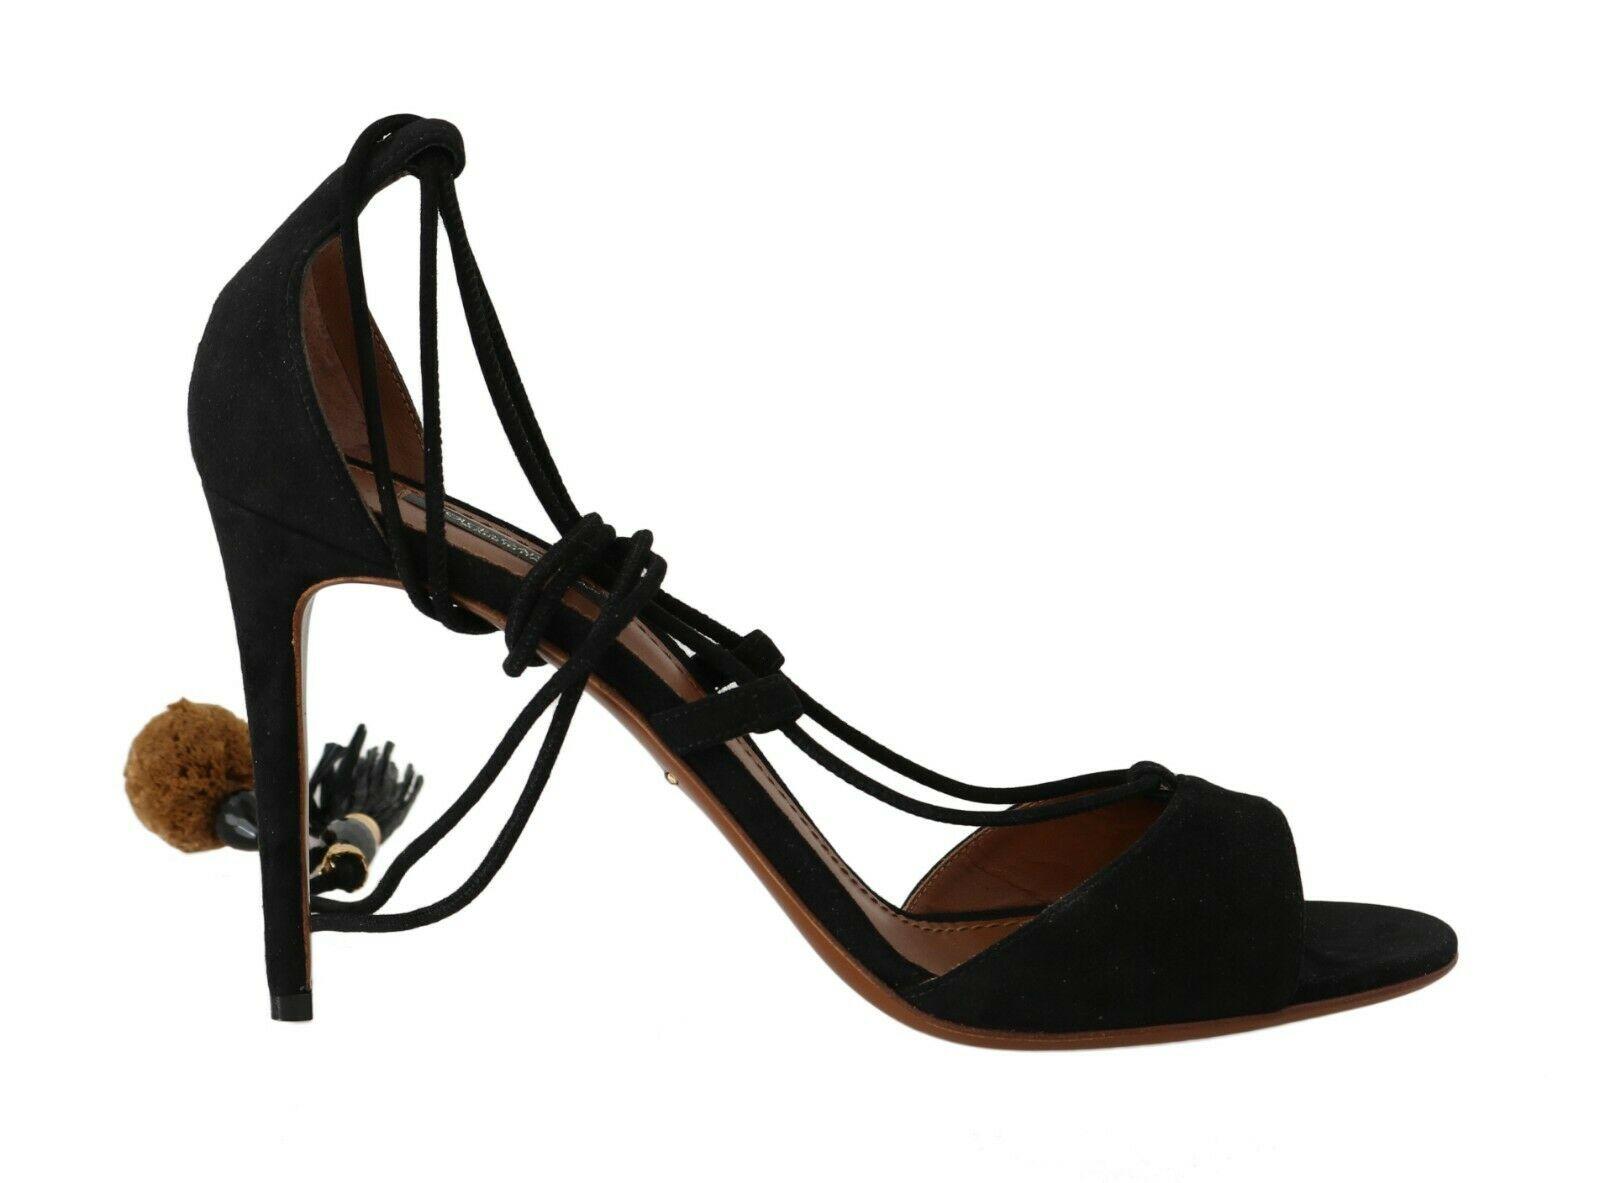 Dolce & Gabbana Women's Suede Tassel Strap Sandals Black LA5611 - EU36.5/US6